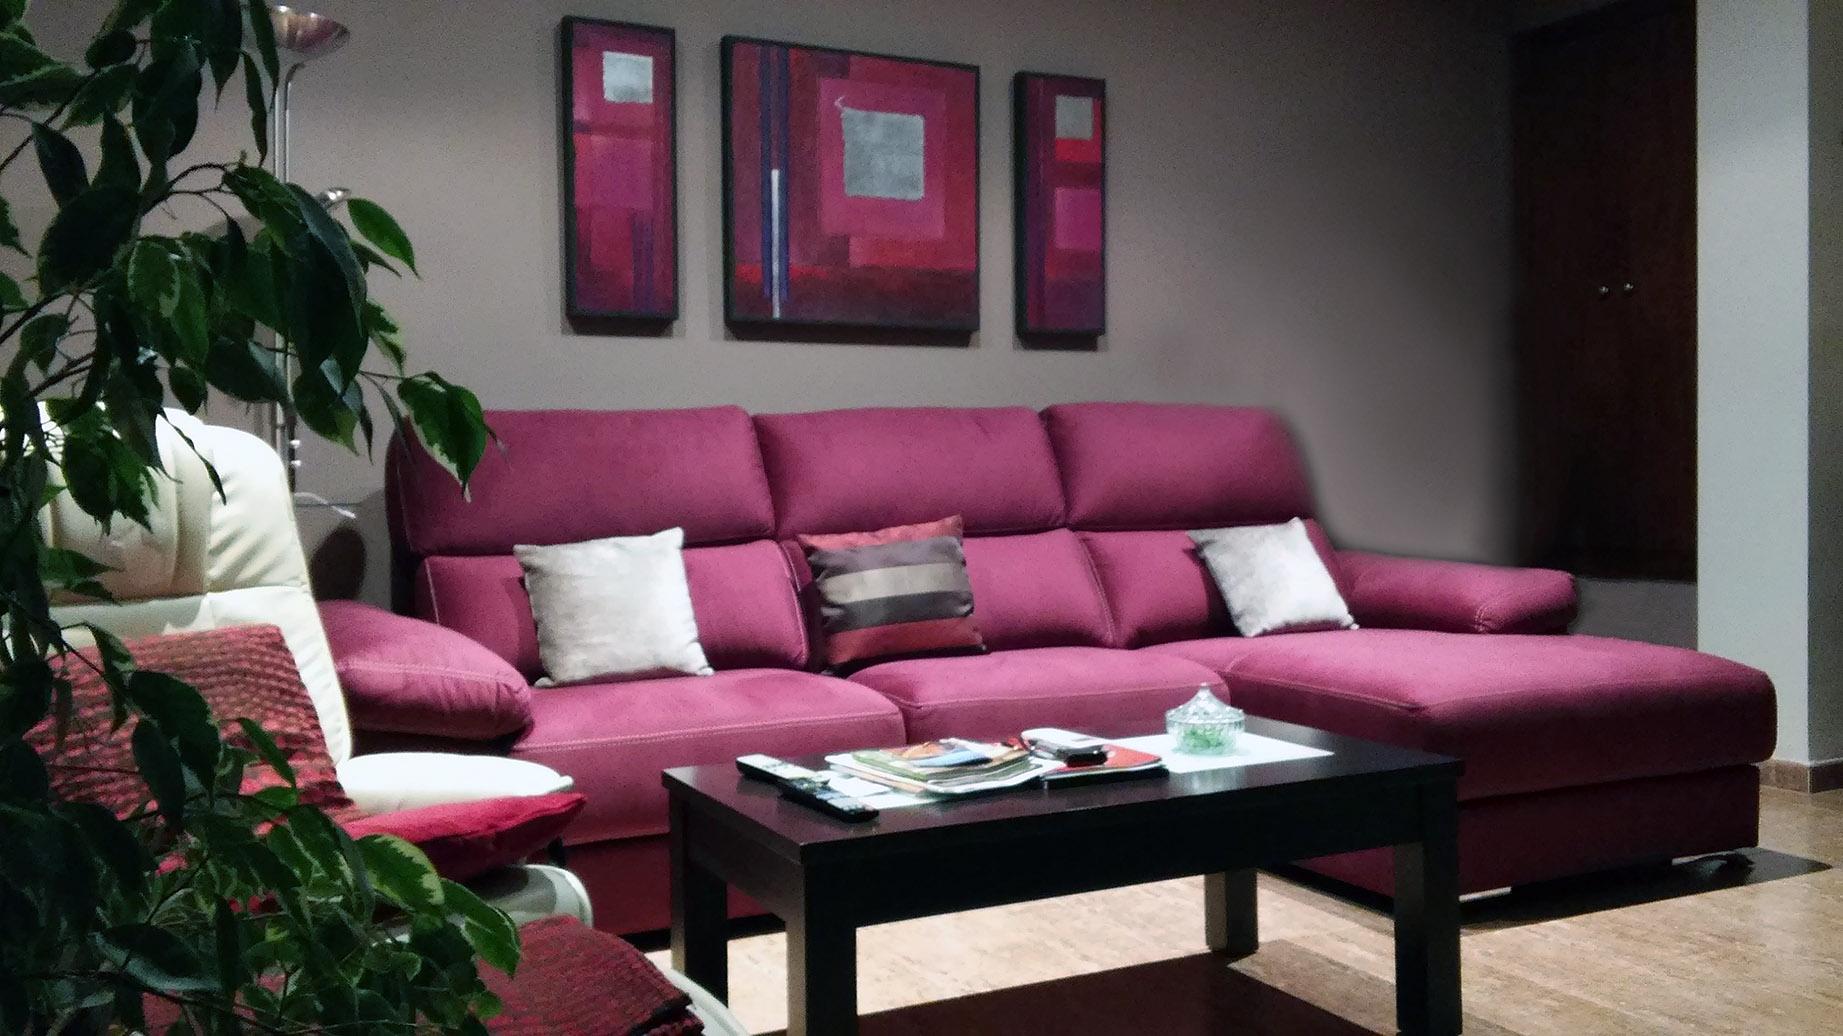 Proyecto 18676 muebles casanova - Muebles casanova catalogo ...